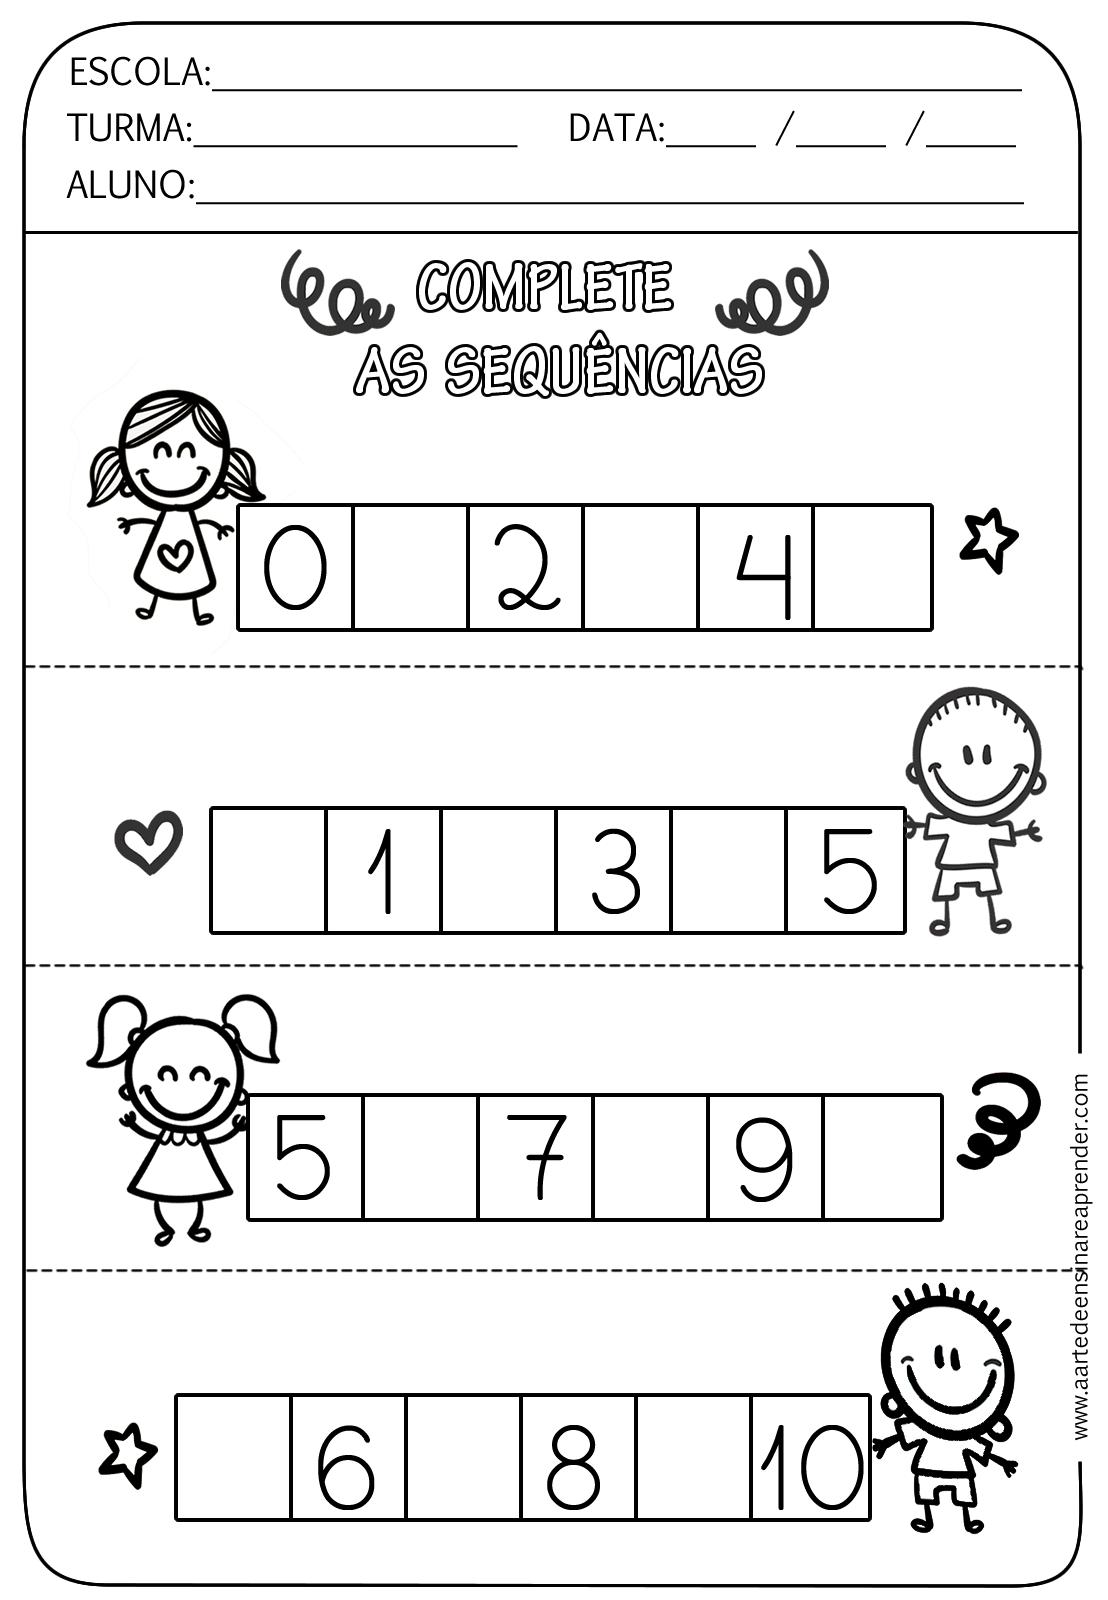 Exemplos de problemas matemáticos